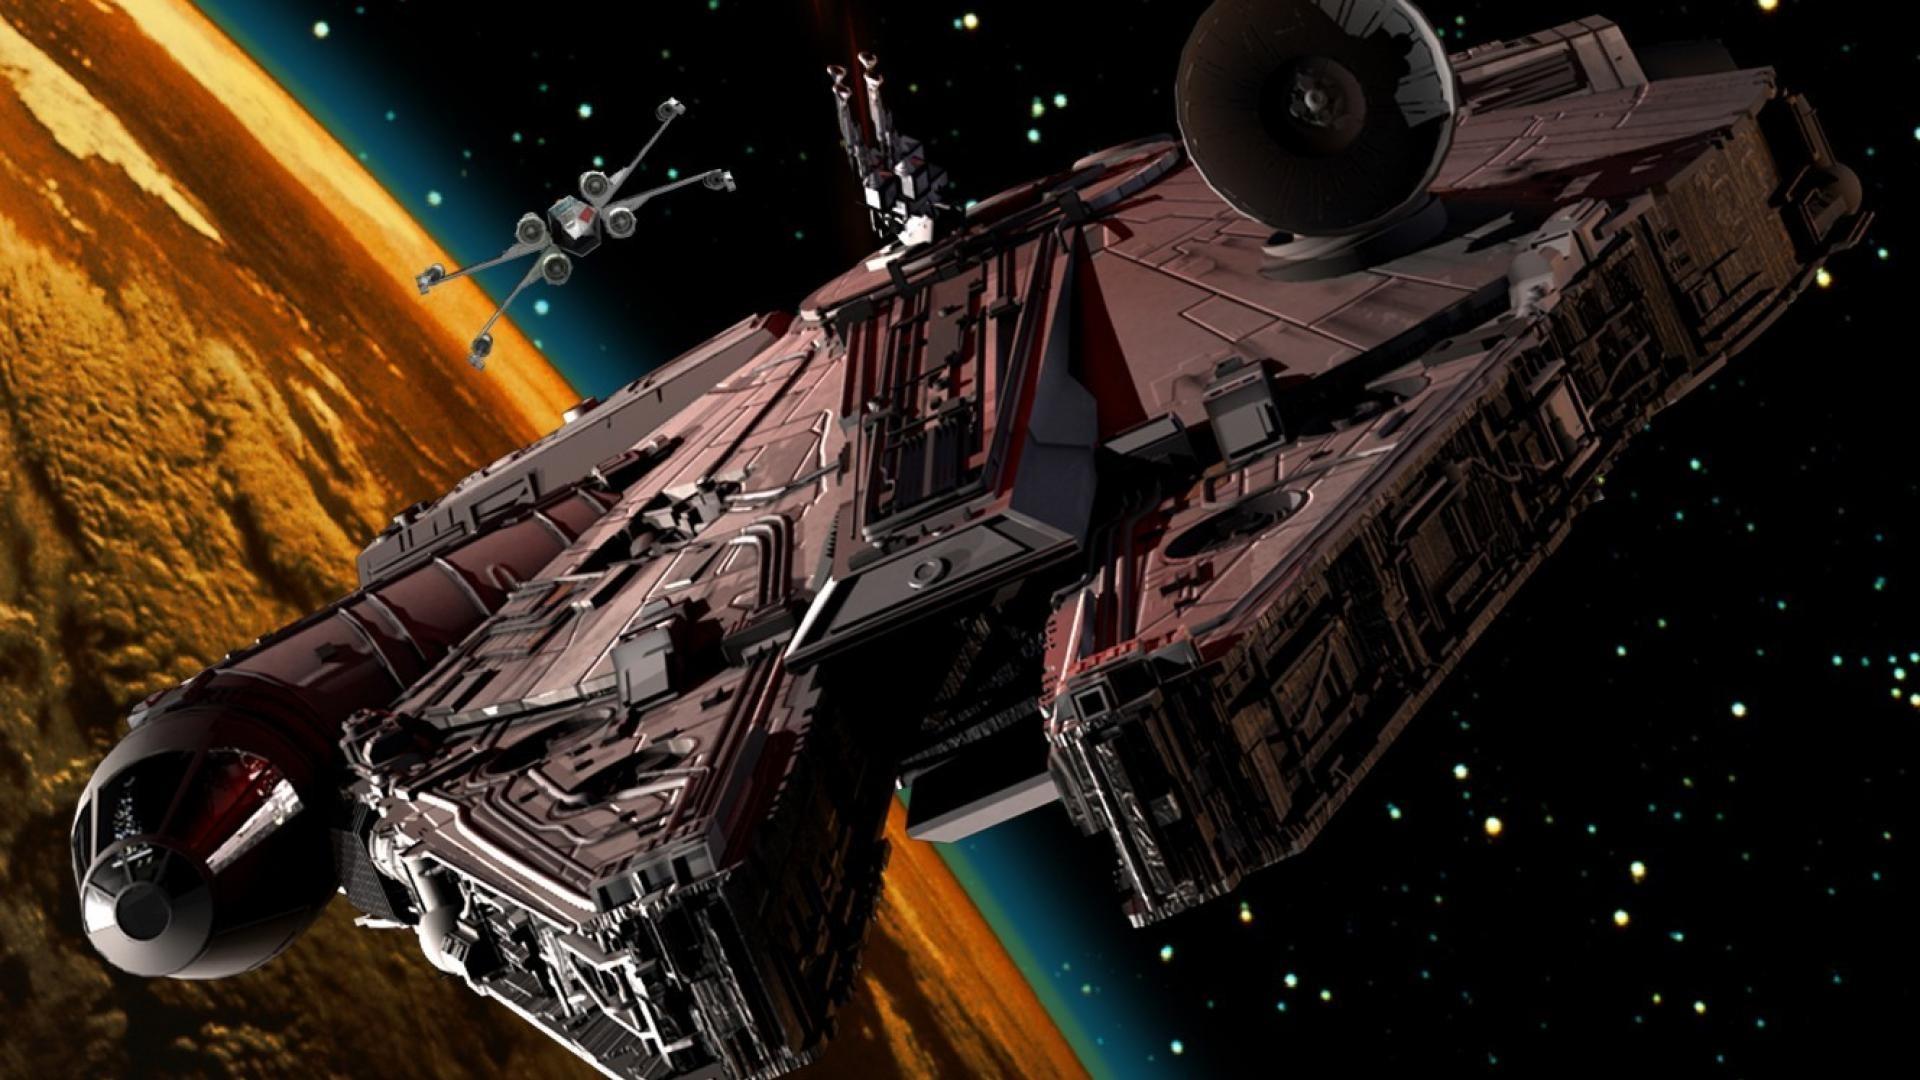 Spaceships millennium falcon x-wing science fiction artwork .